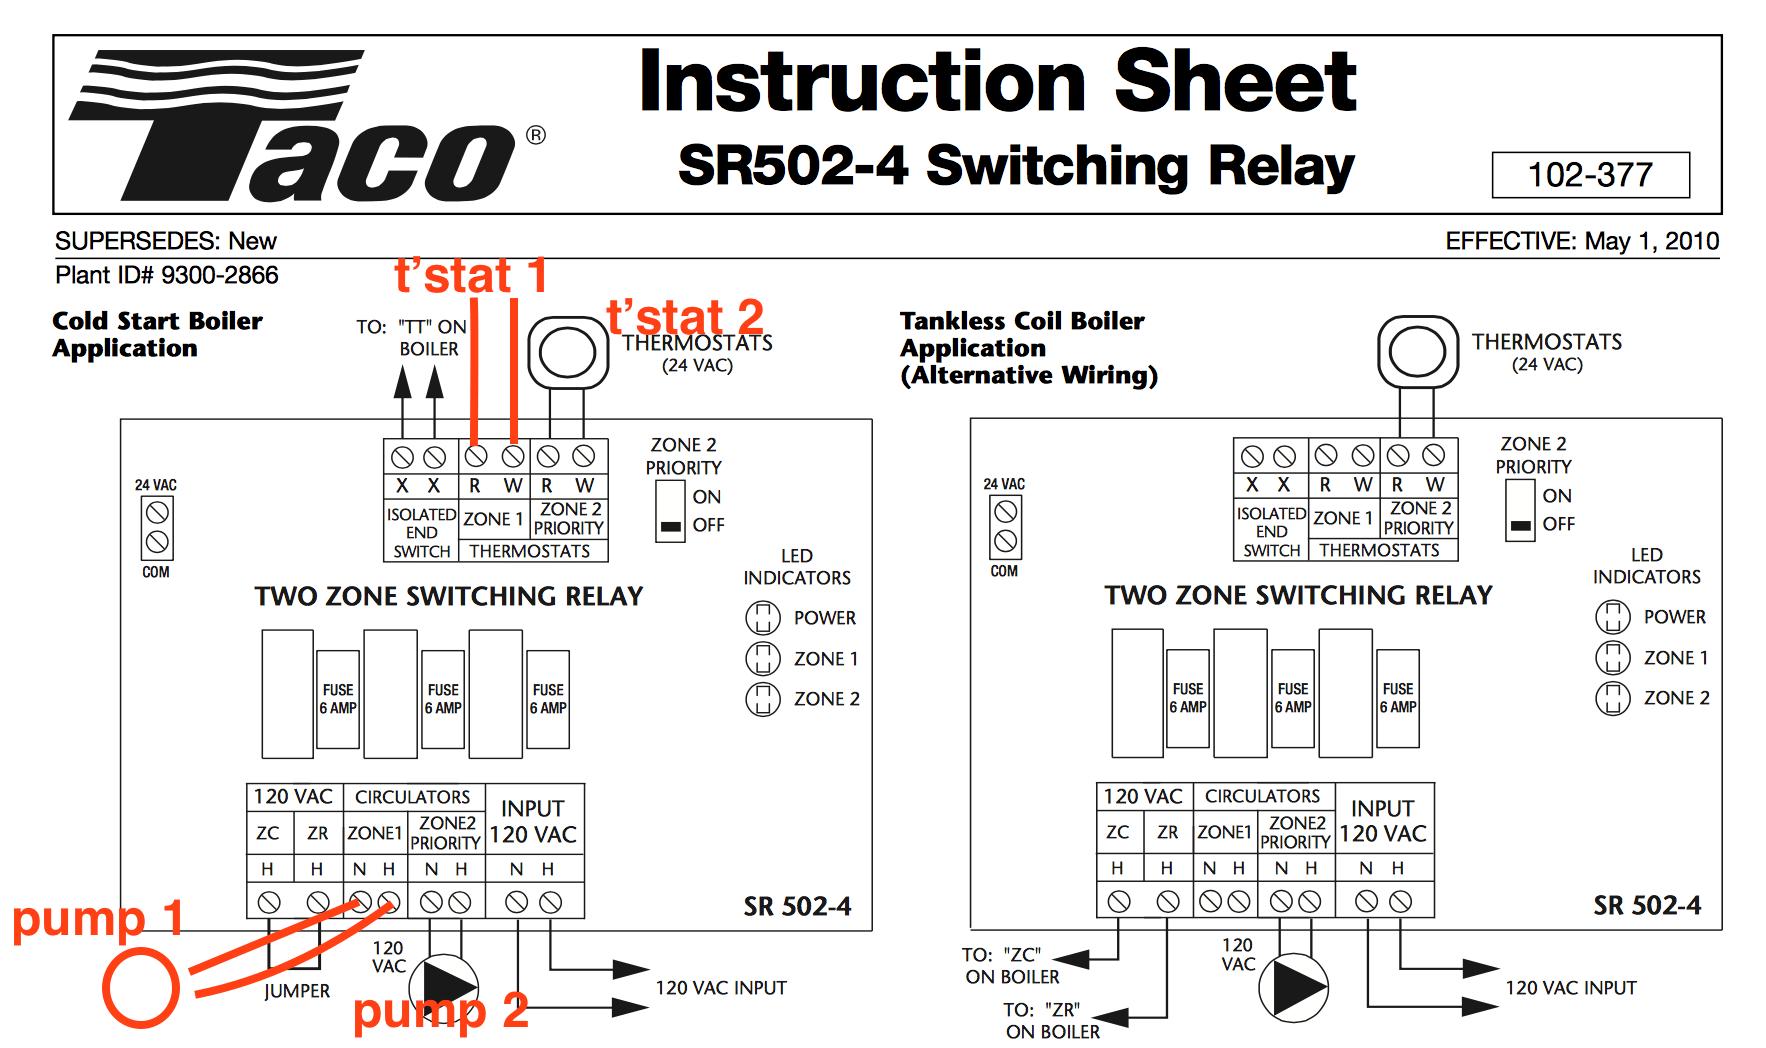 dd924aaeab9192997346f0501a5efd?resize\=665%2C395\&ssl\=1 thermolec plenum heater wiring diagram gandul 45 77 79 119  at edmiracle.co